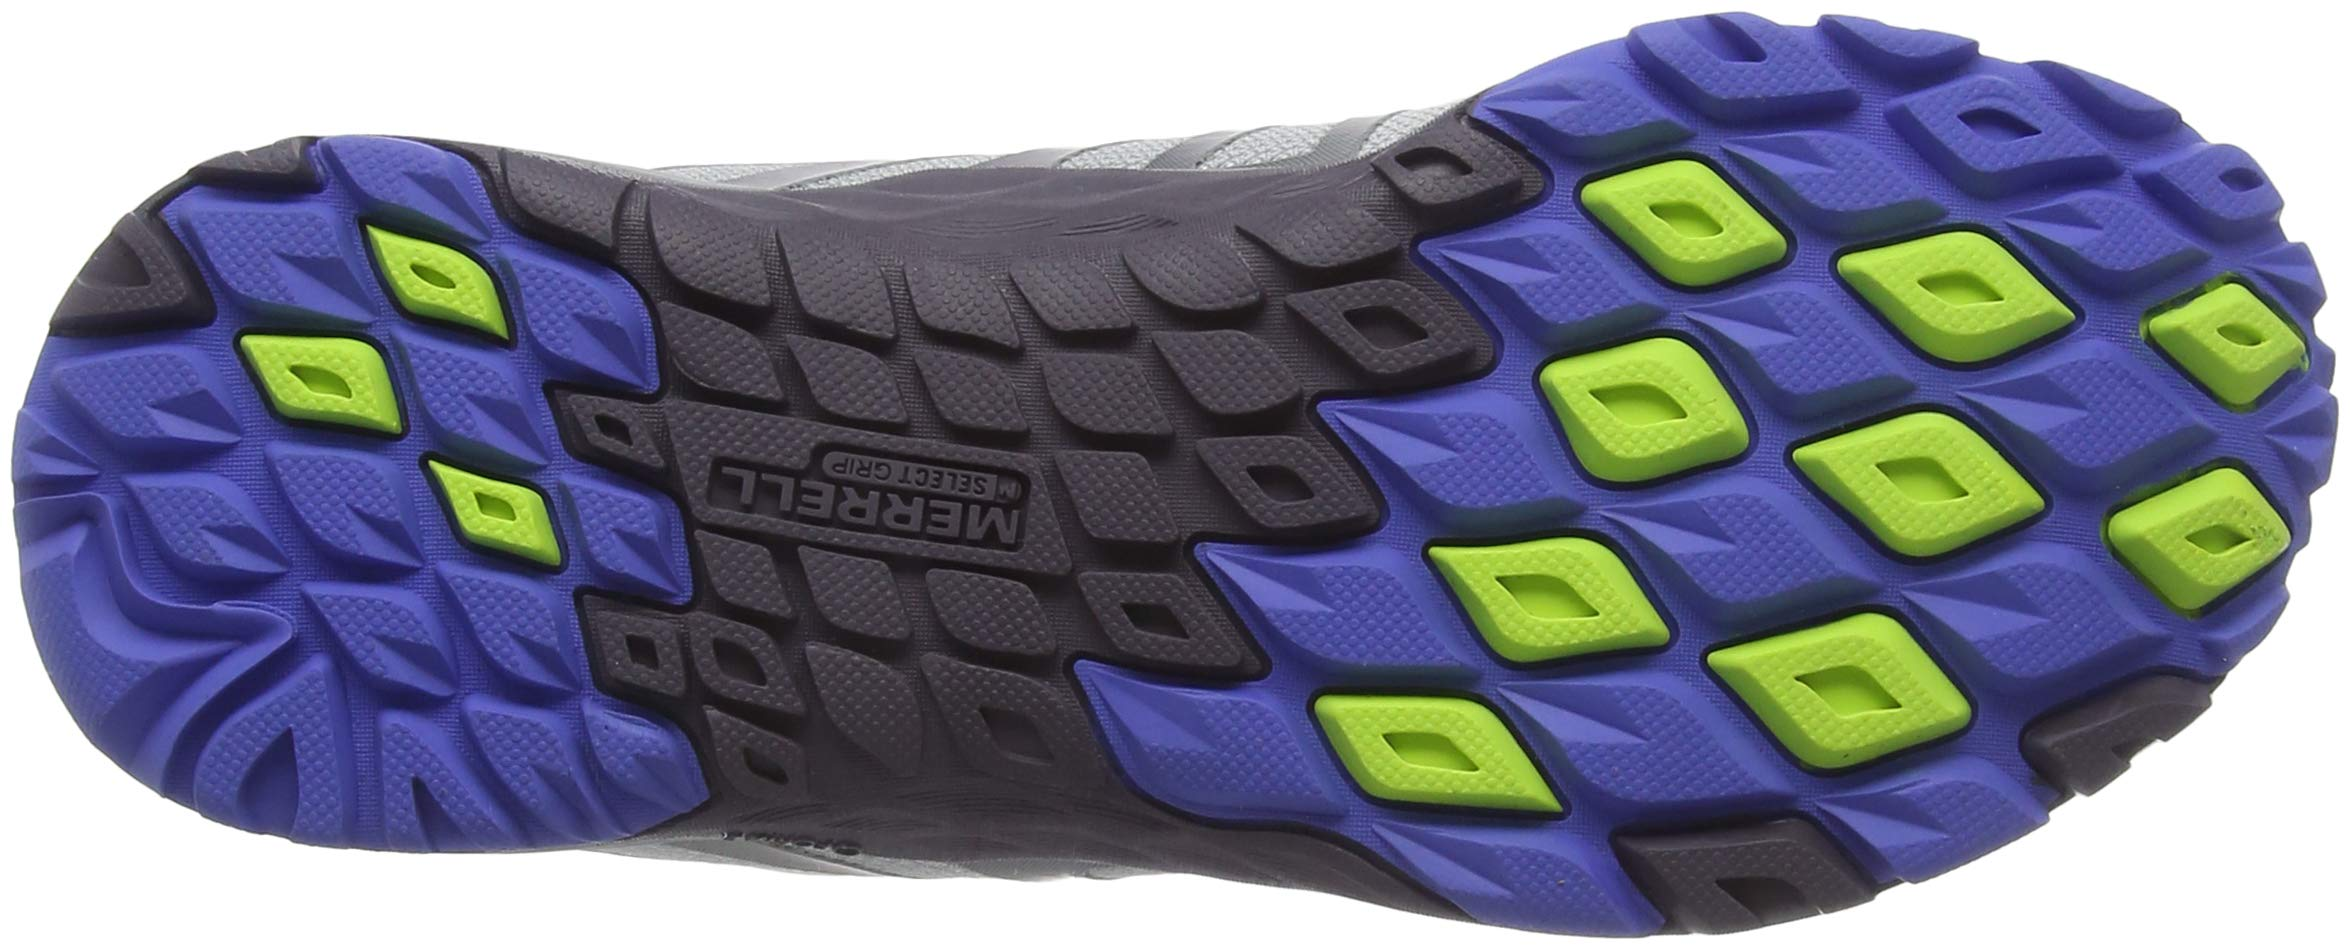 Merrell Women's Siren Edge Q2 Wp Low Rise Hiking Boots